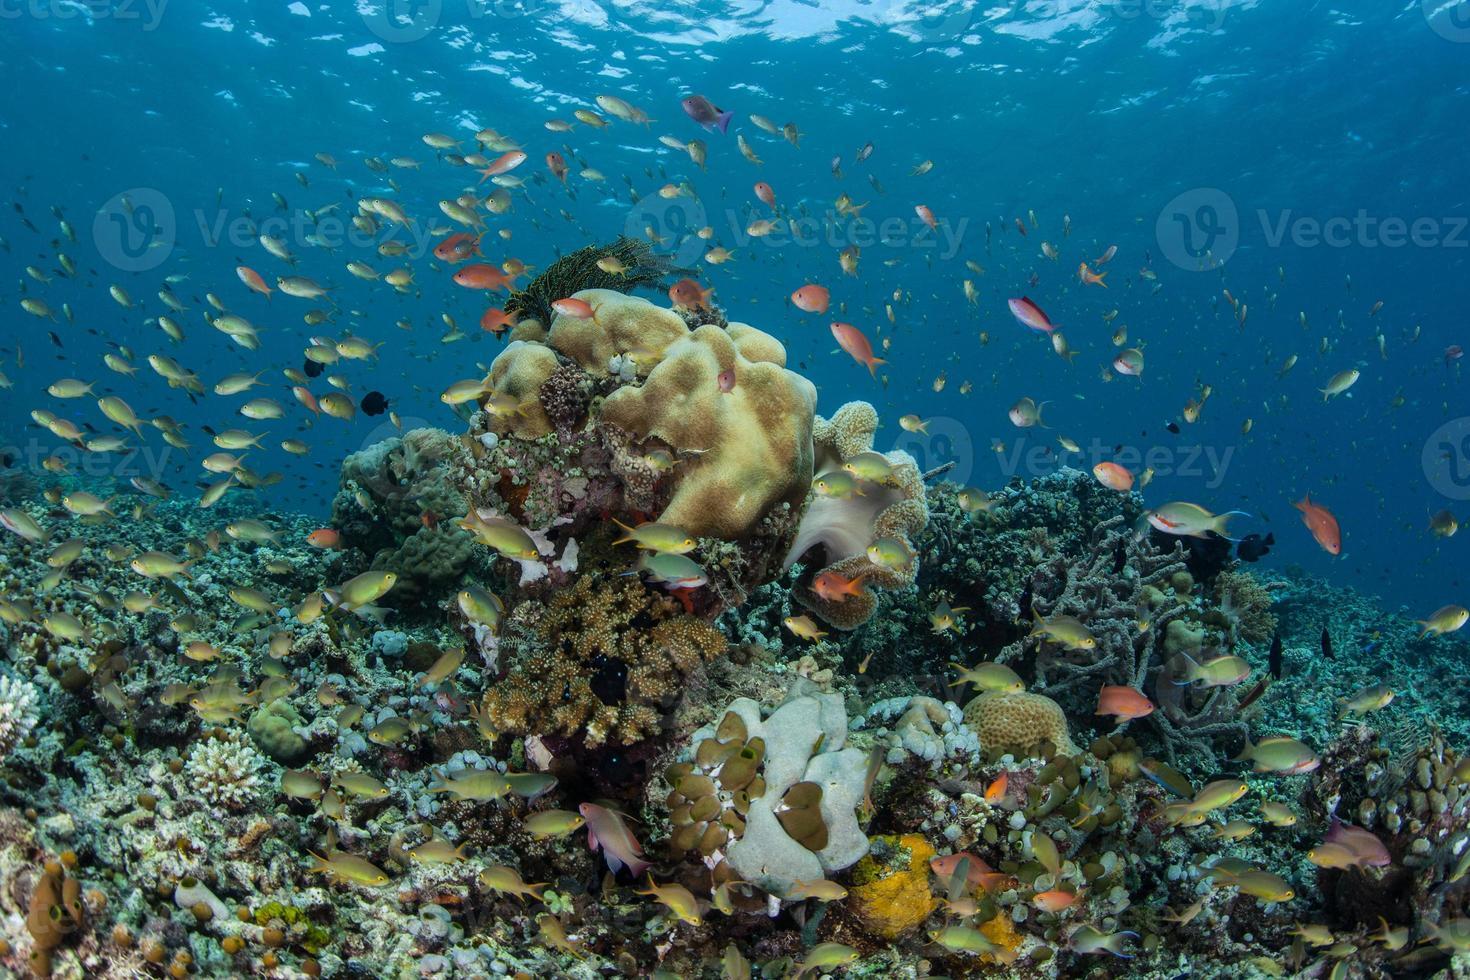 Vibrant Reef Fish photo